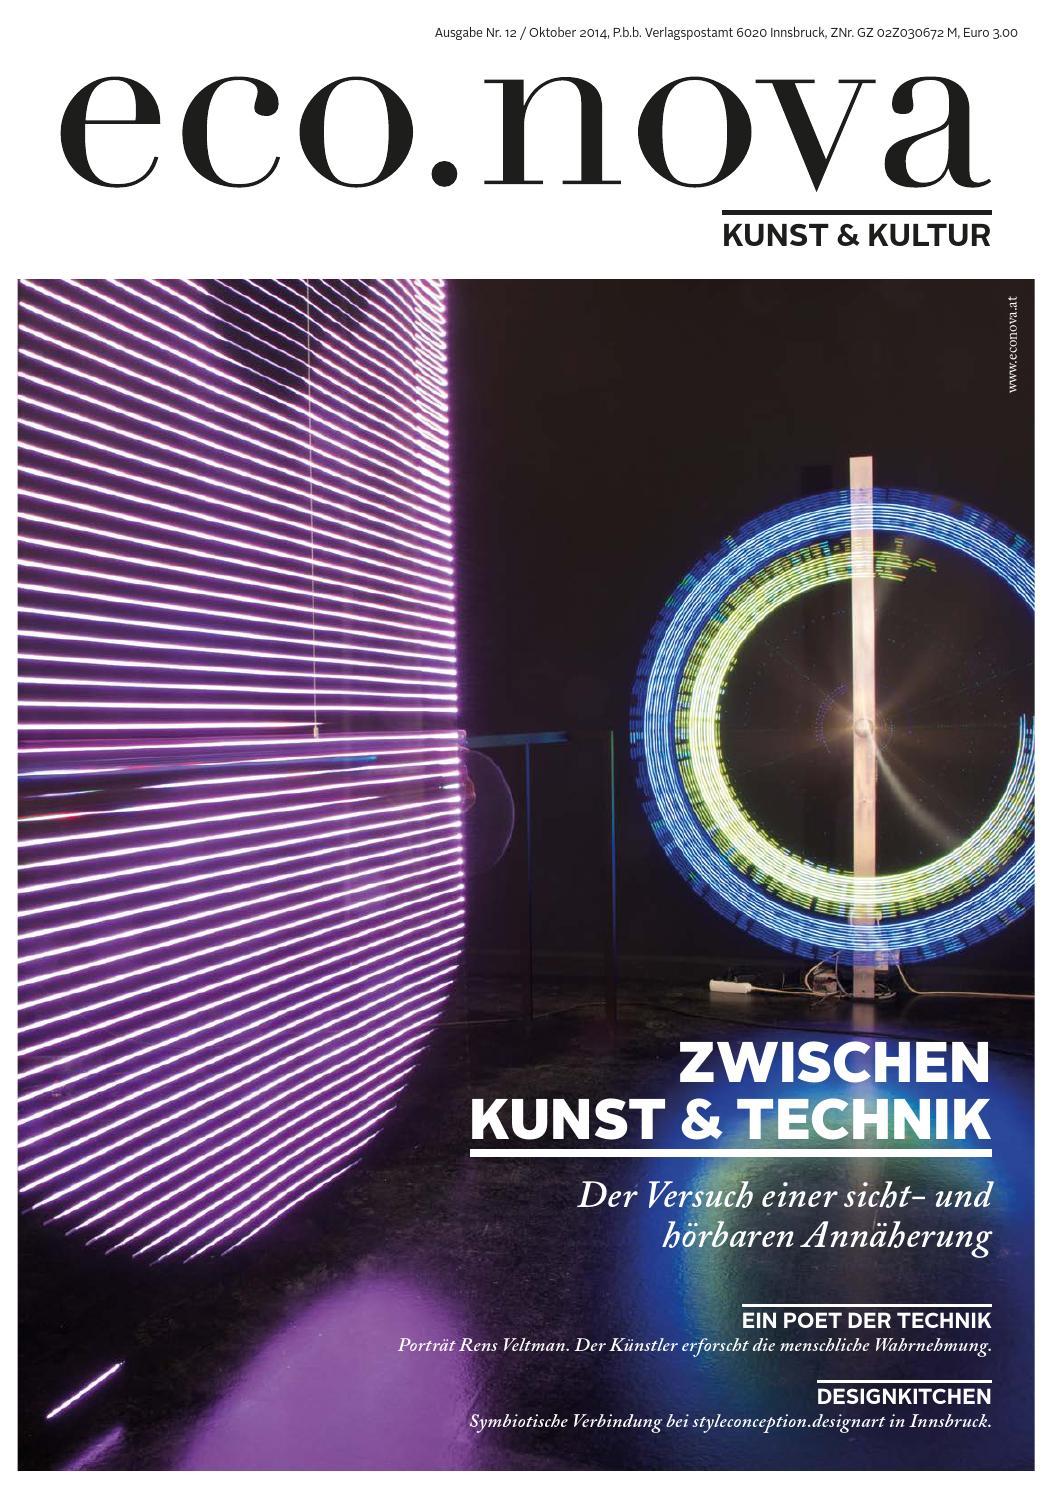 Spezial Kunst 2014 By Eco Nova Verlags Gmbh Issuu